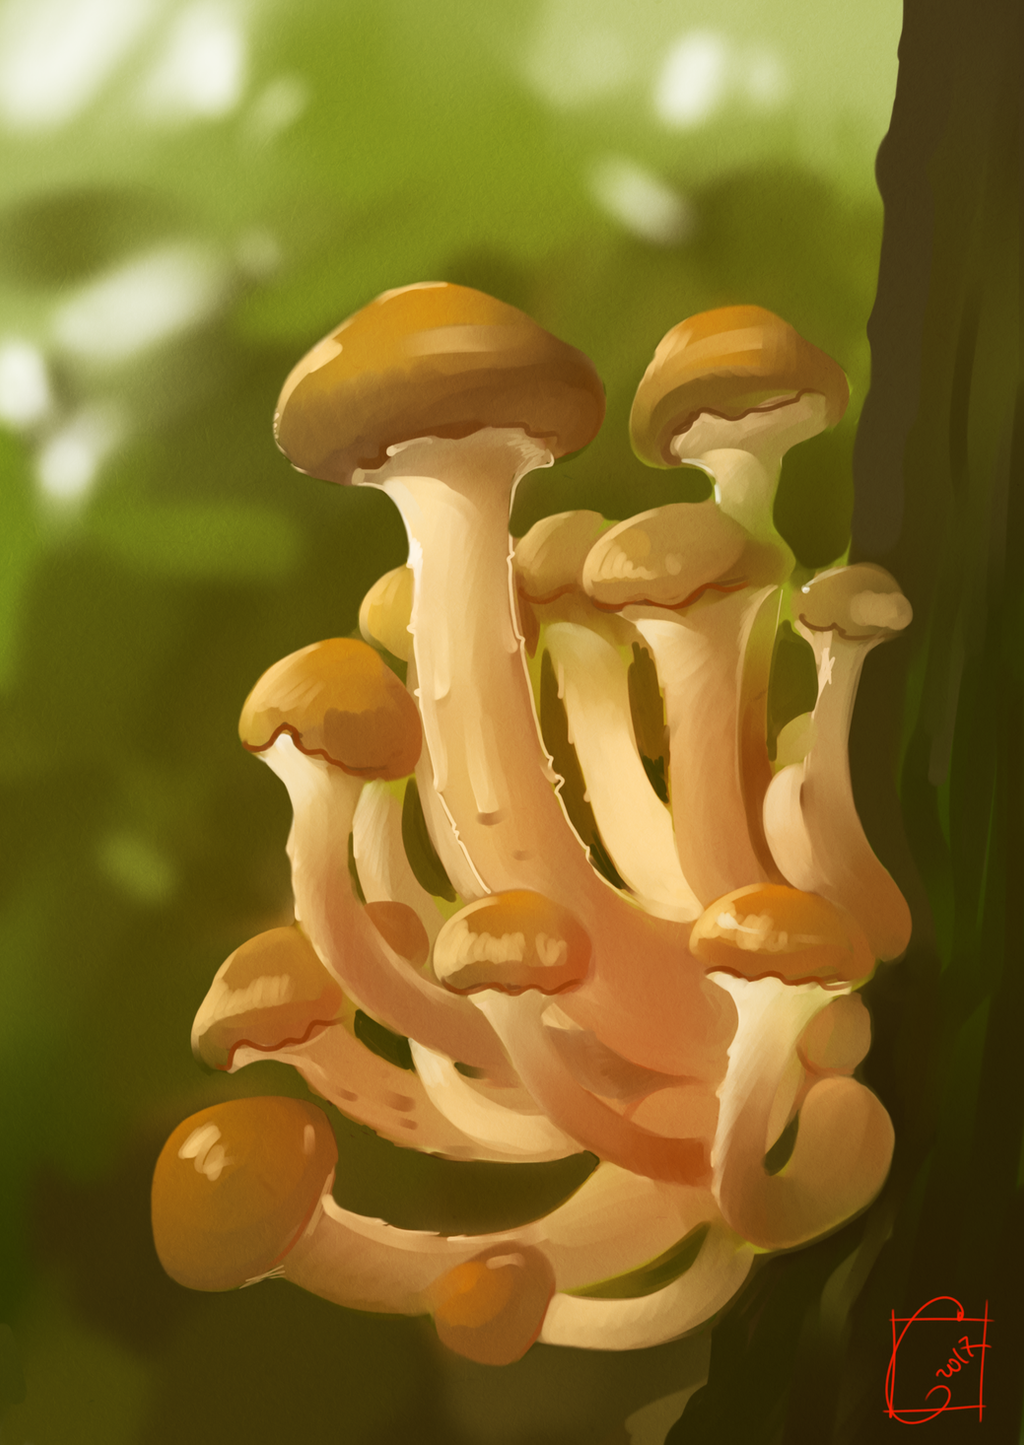 mushrooms by GaudiBuendia